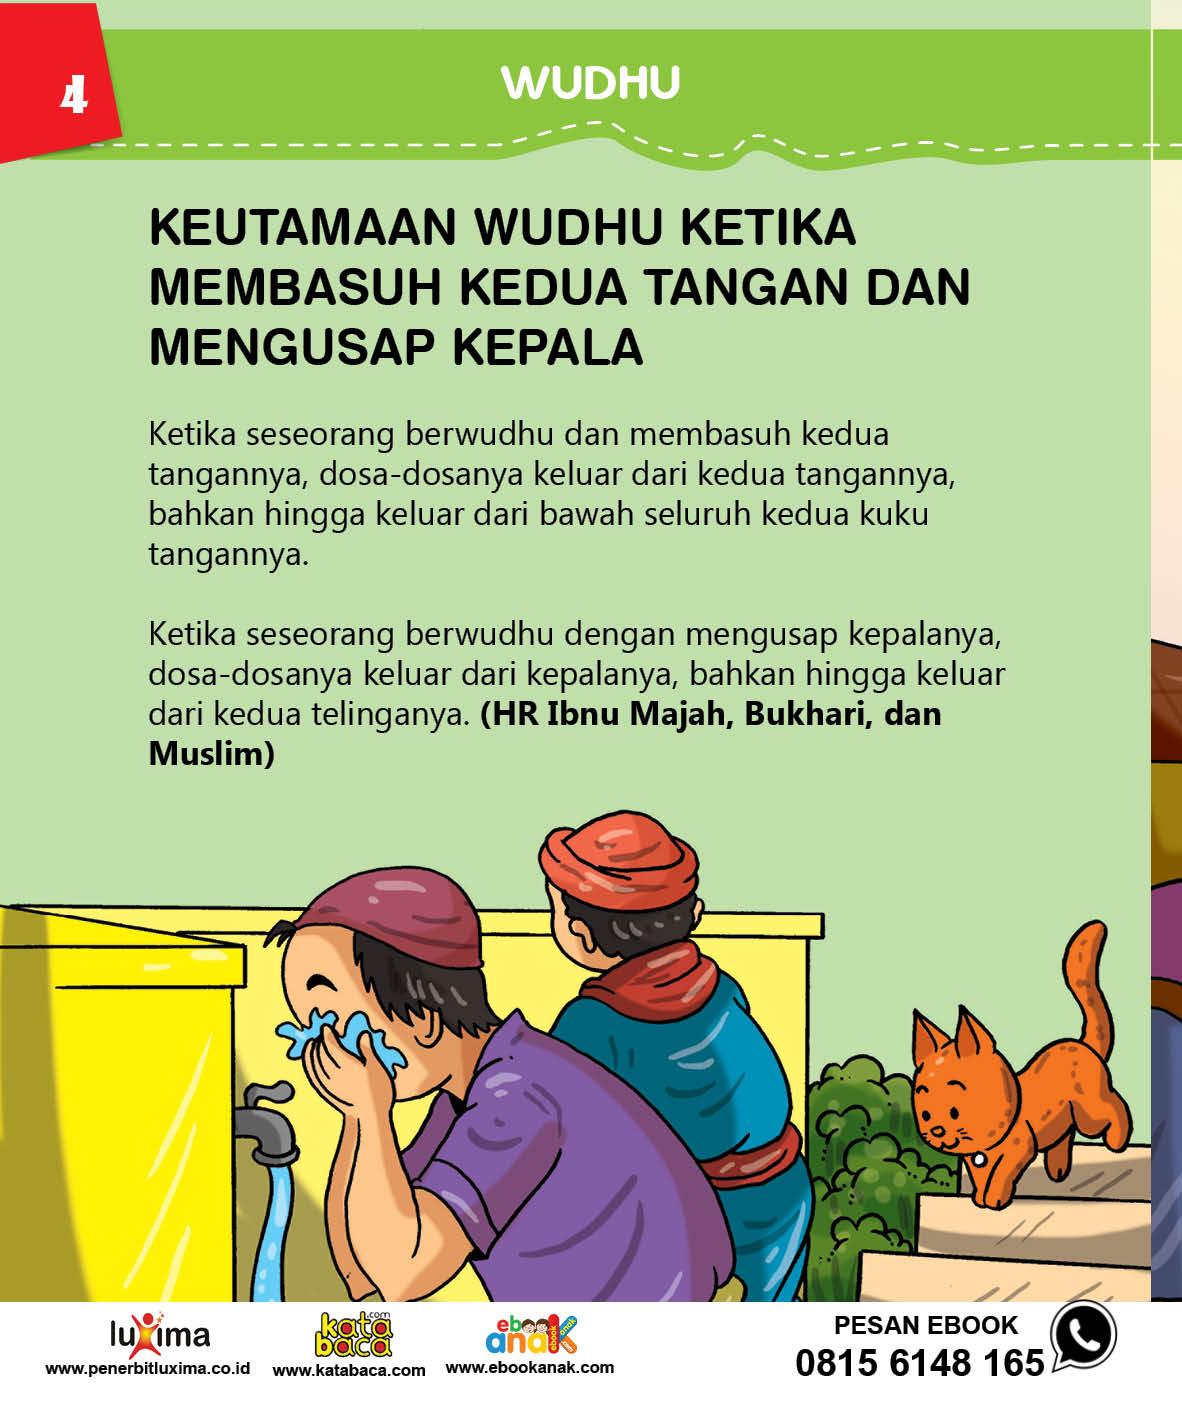 baca buku islam online, fiqih islam bergambar for kids jilid 28 Apa Keutamaan Mengusap Kedua Tangan Ketika Wudhu